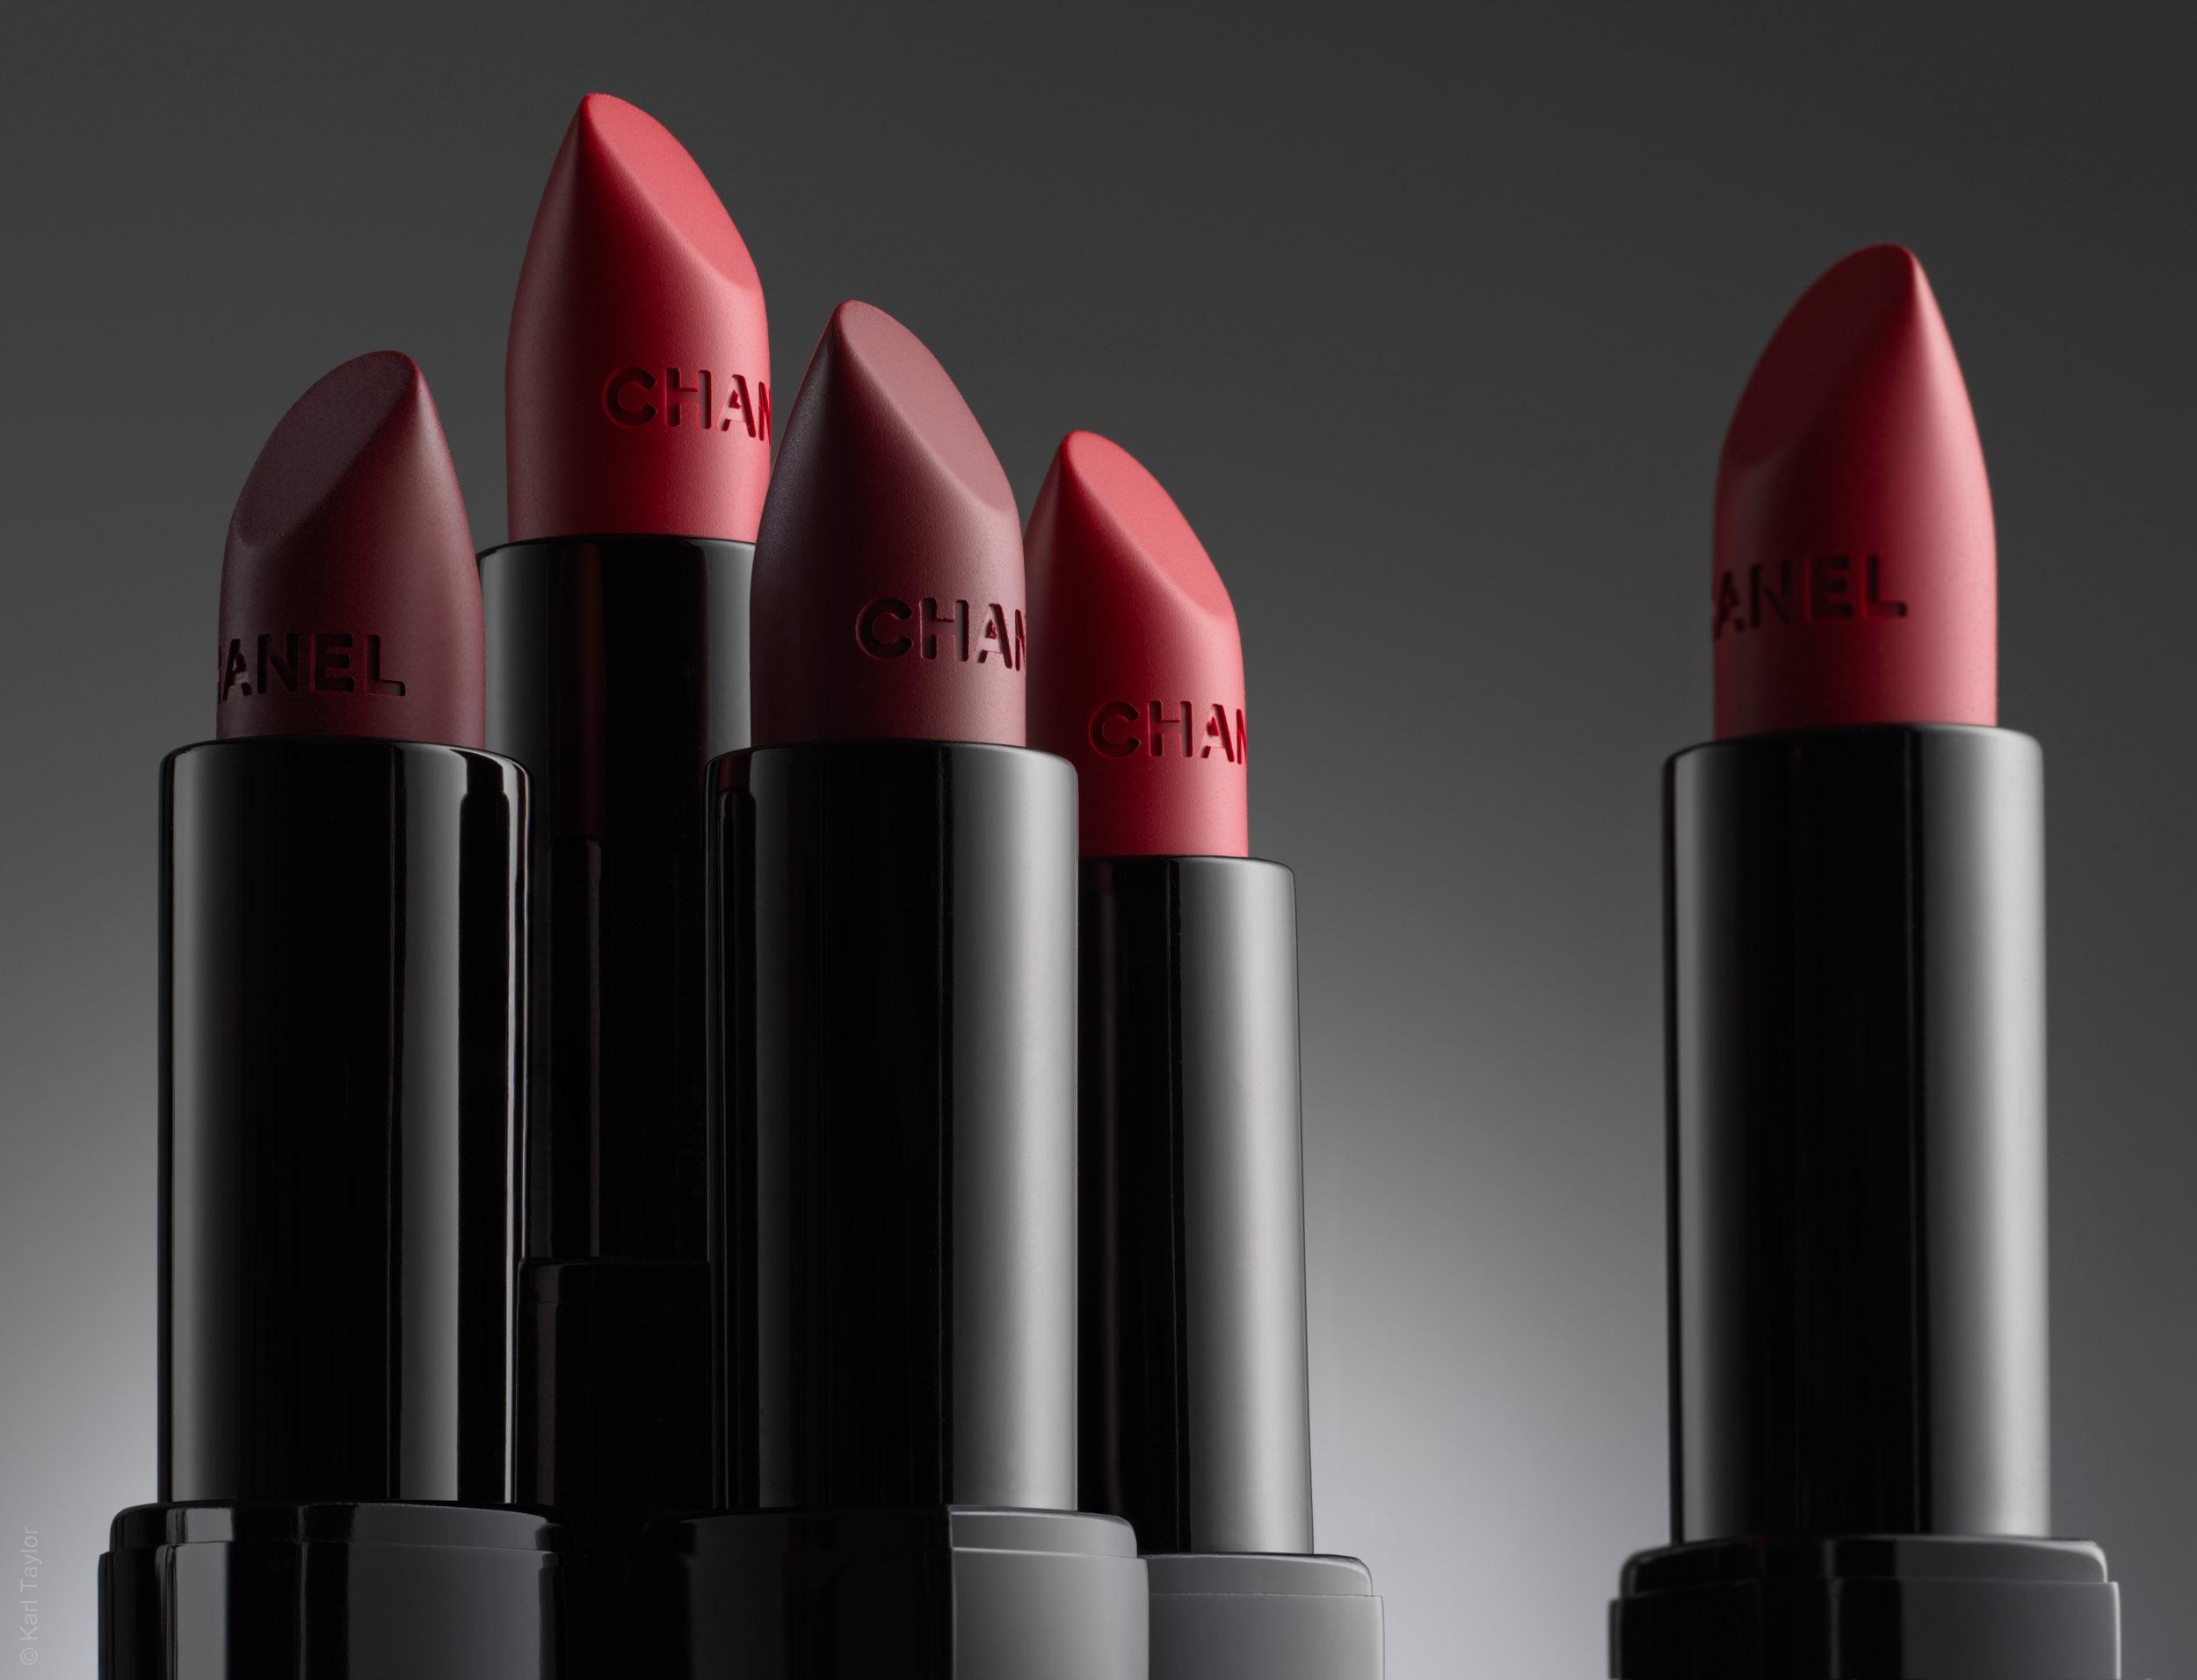 Chanel_lipstick_karl_taylor_web.jpg